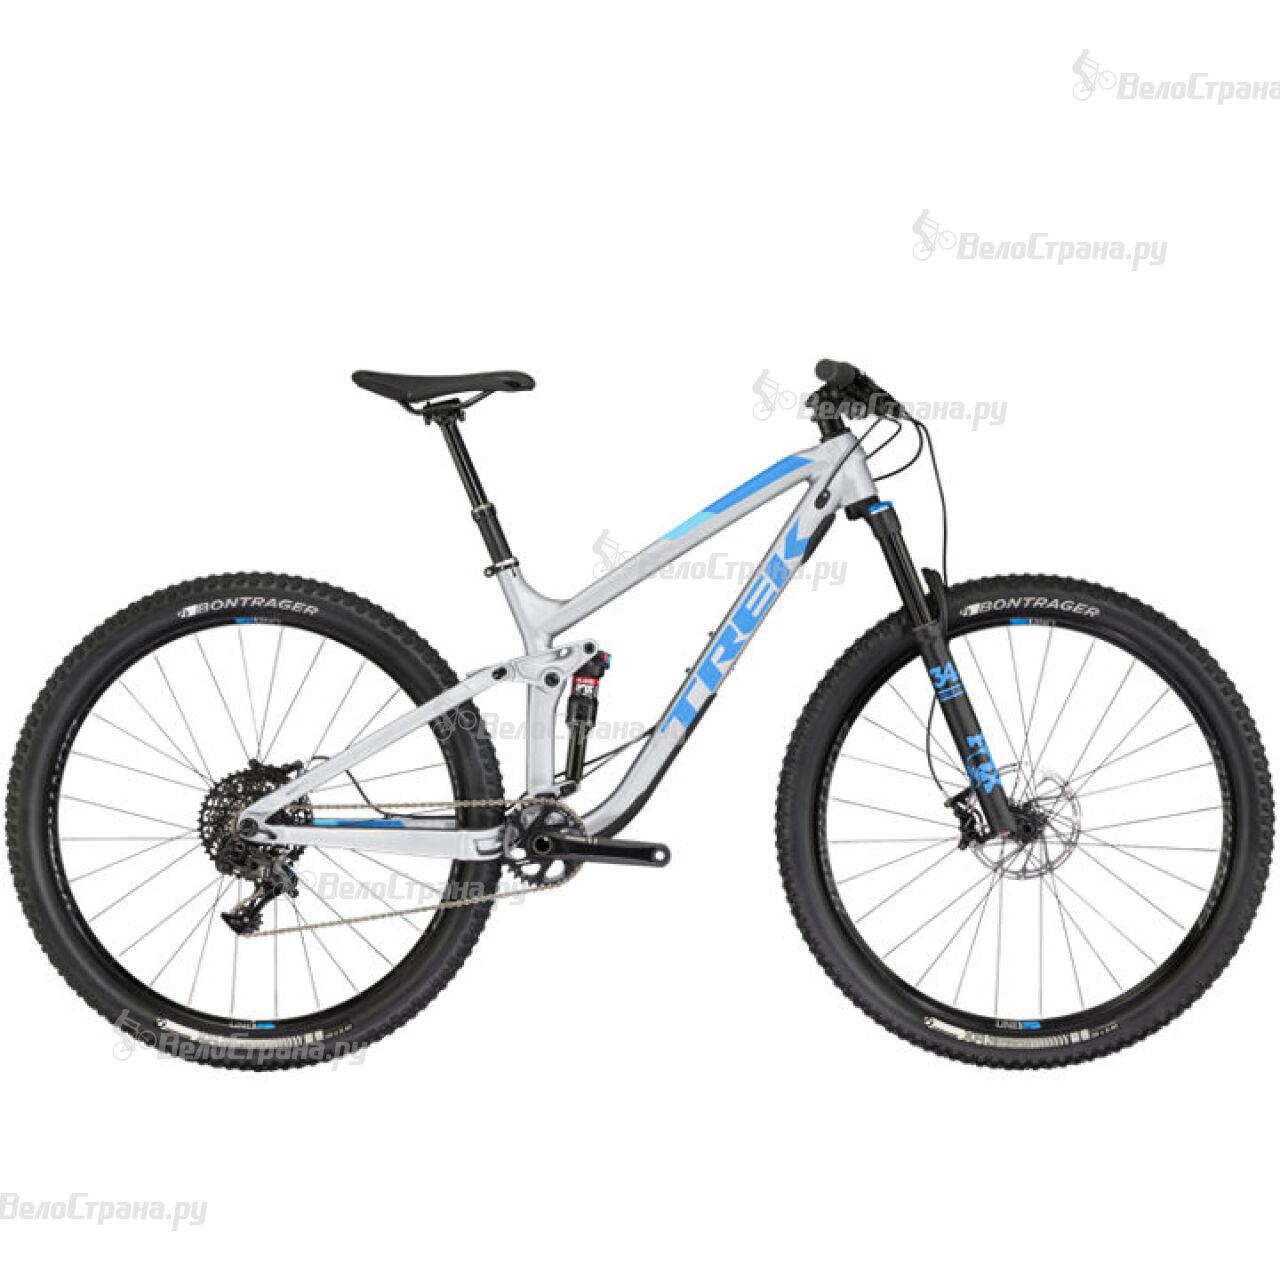 Велосипед Trek Fuel EX 9 29 (2017) велосипед trek fuel ex 9 29 2017